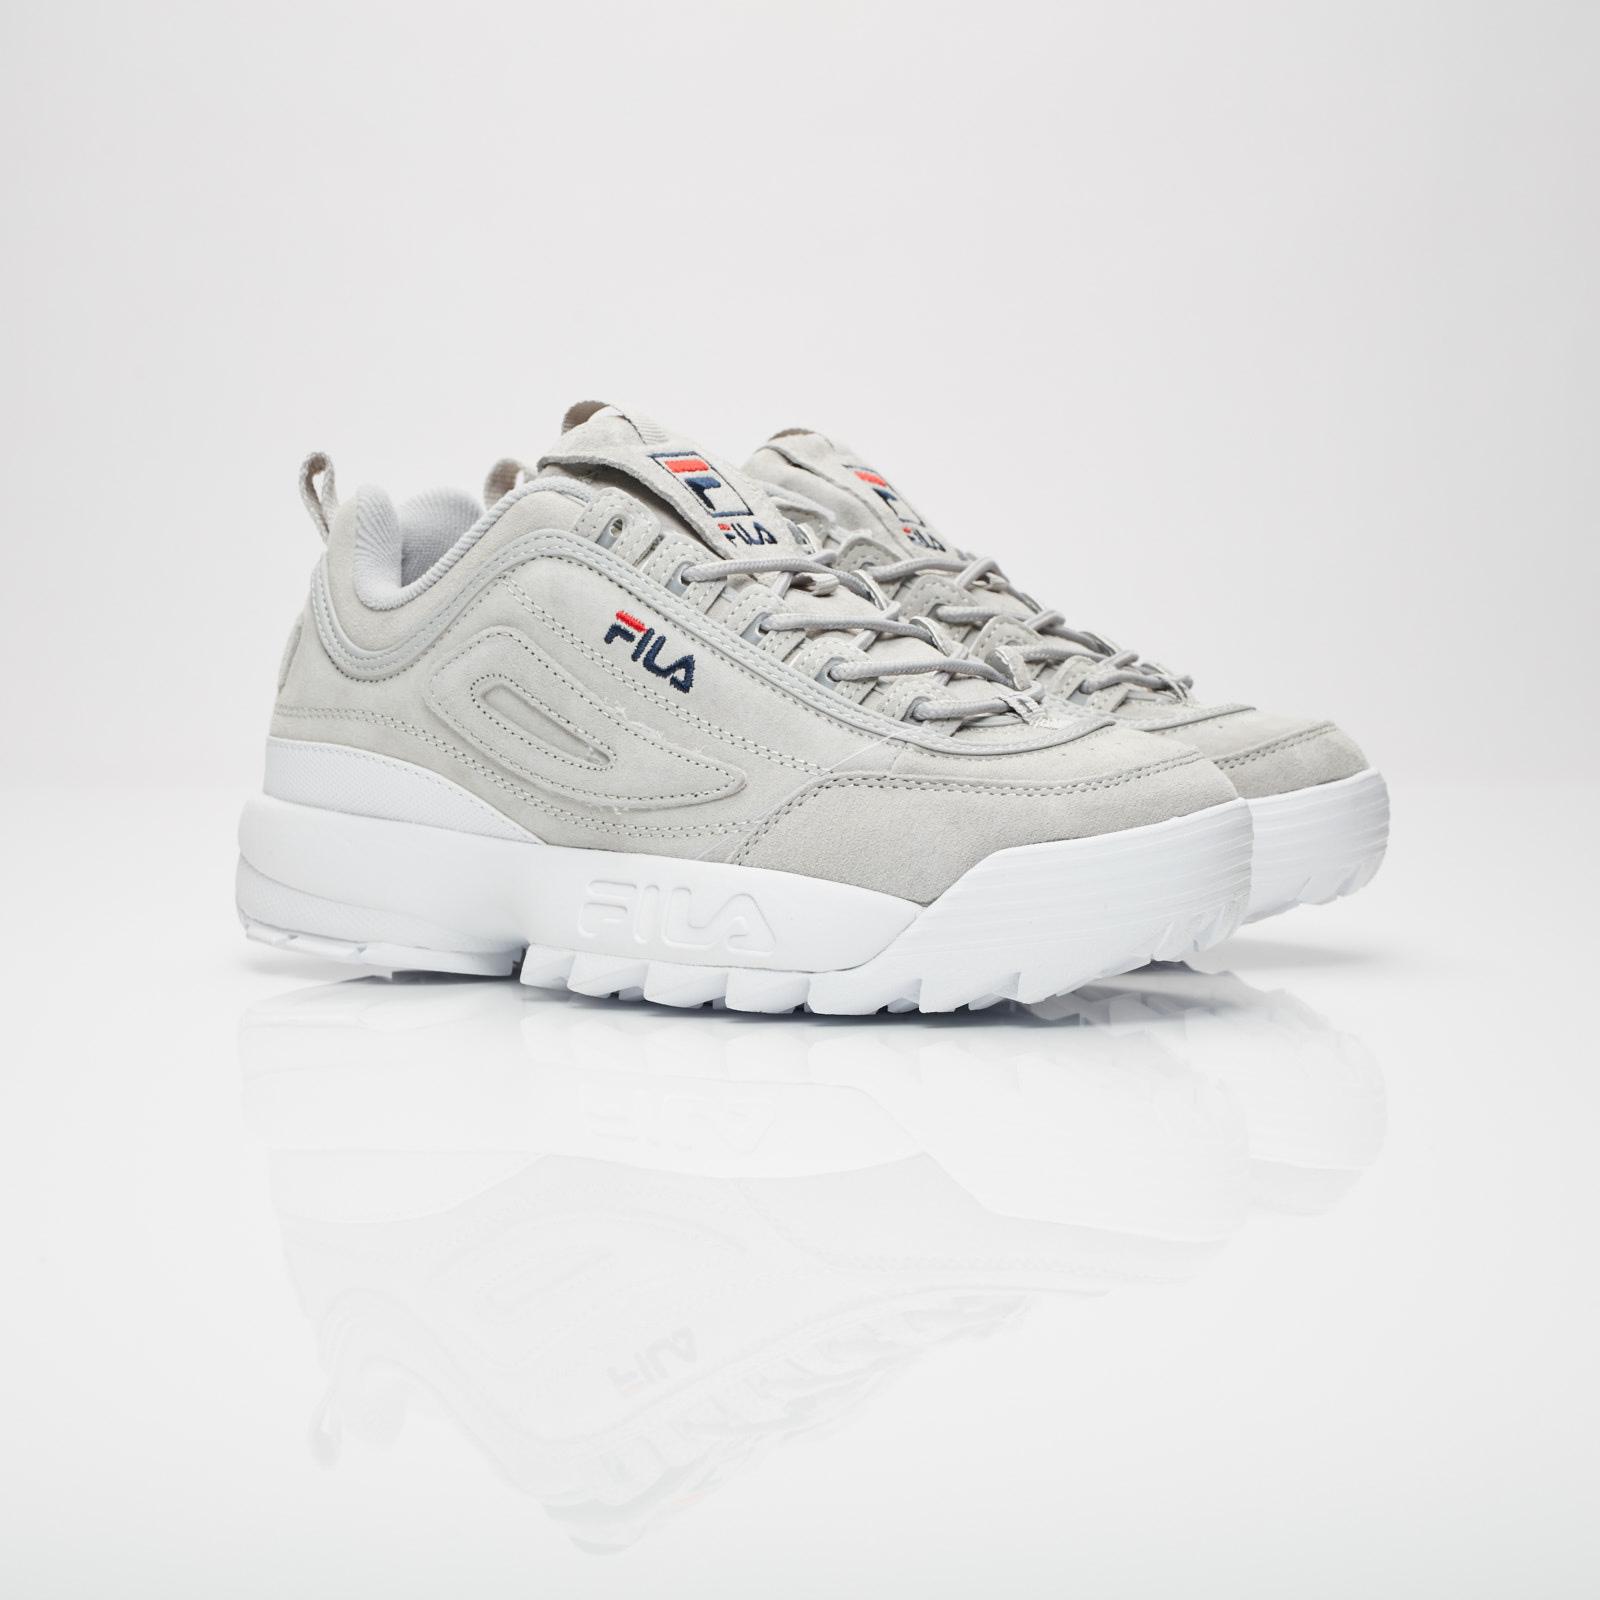 Fila Disruptor II Premium Suede - 5fm00038-063 - Sneakersnstuff ...